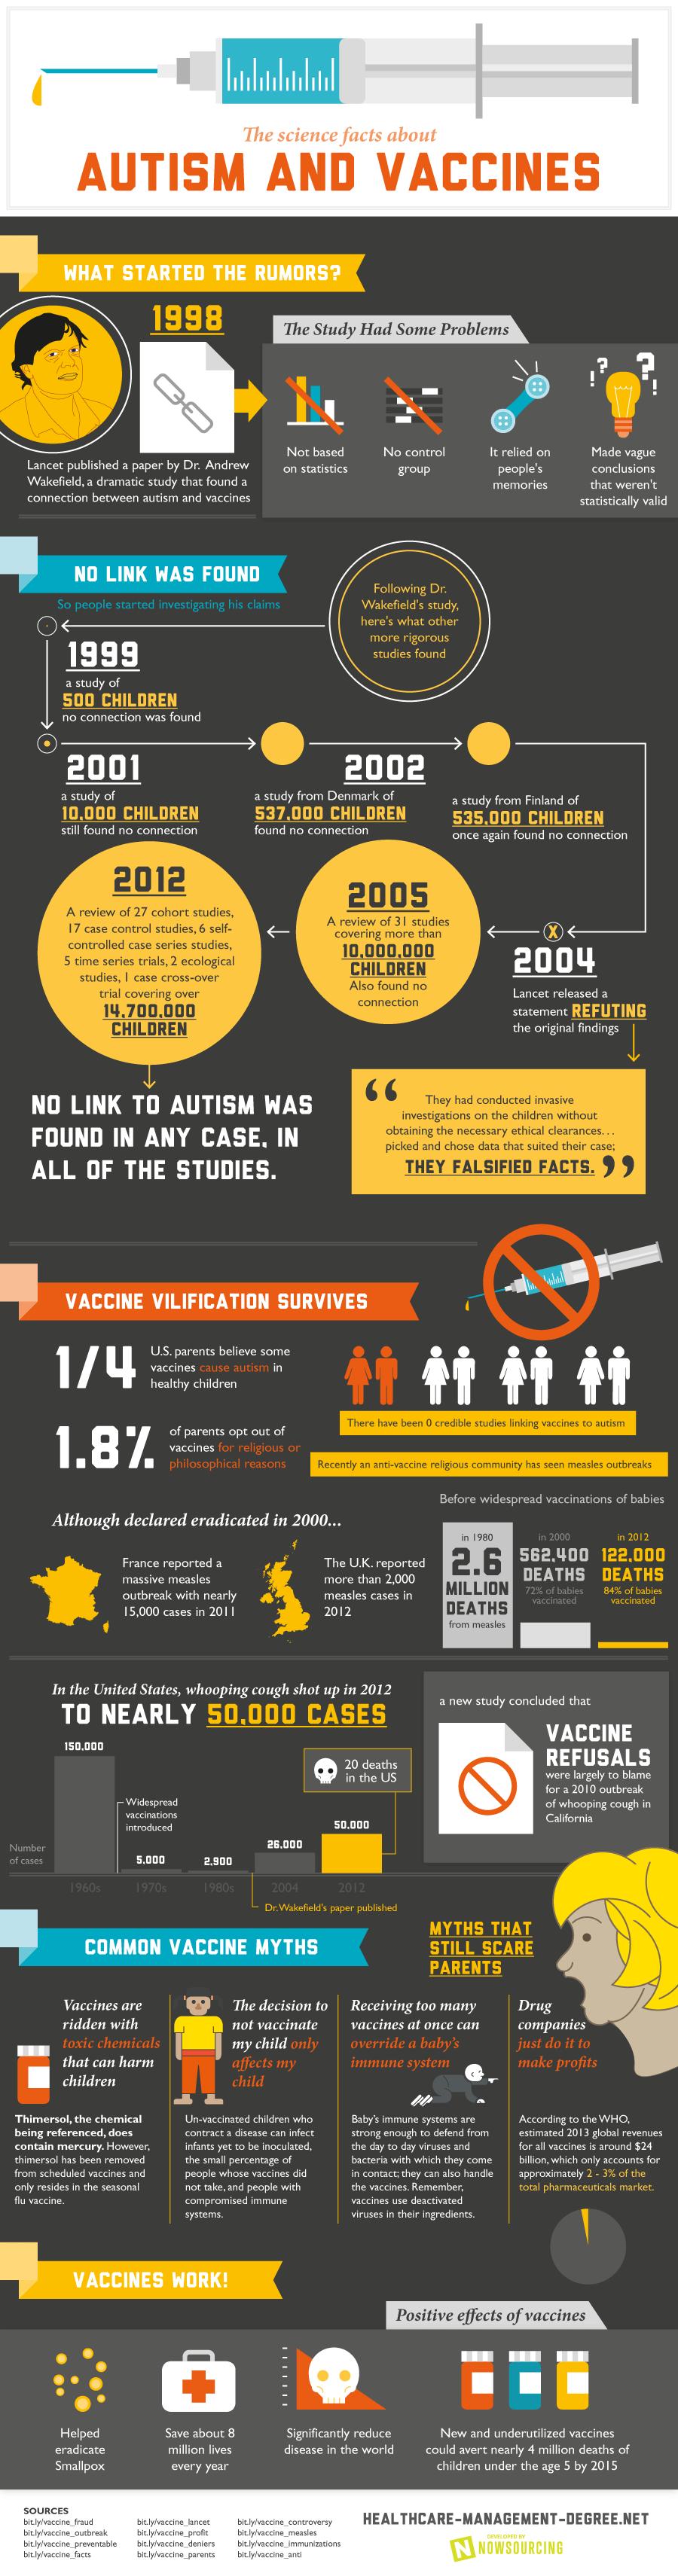 vaccines-and-autism-89a95934a2e5e6433d229e2f44ee4b8f